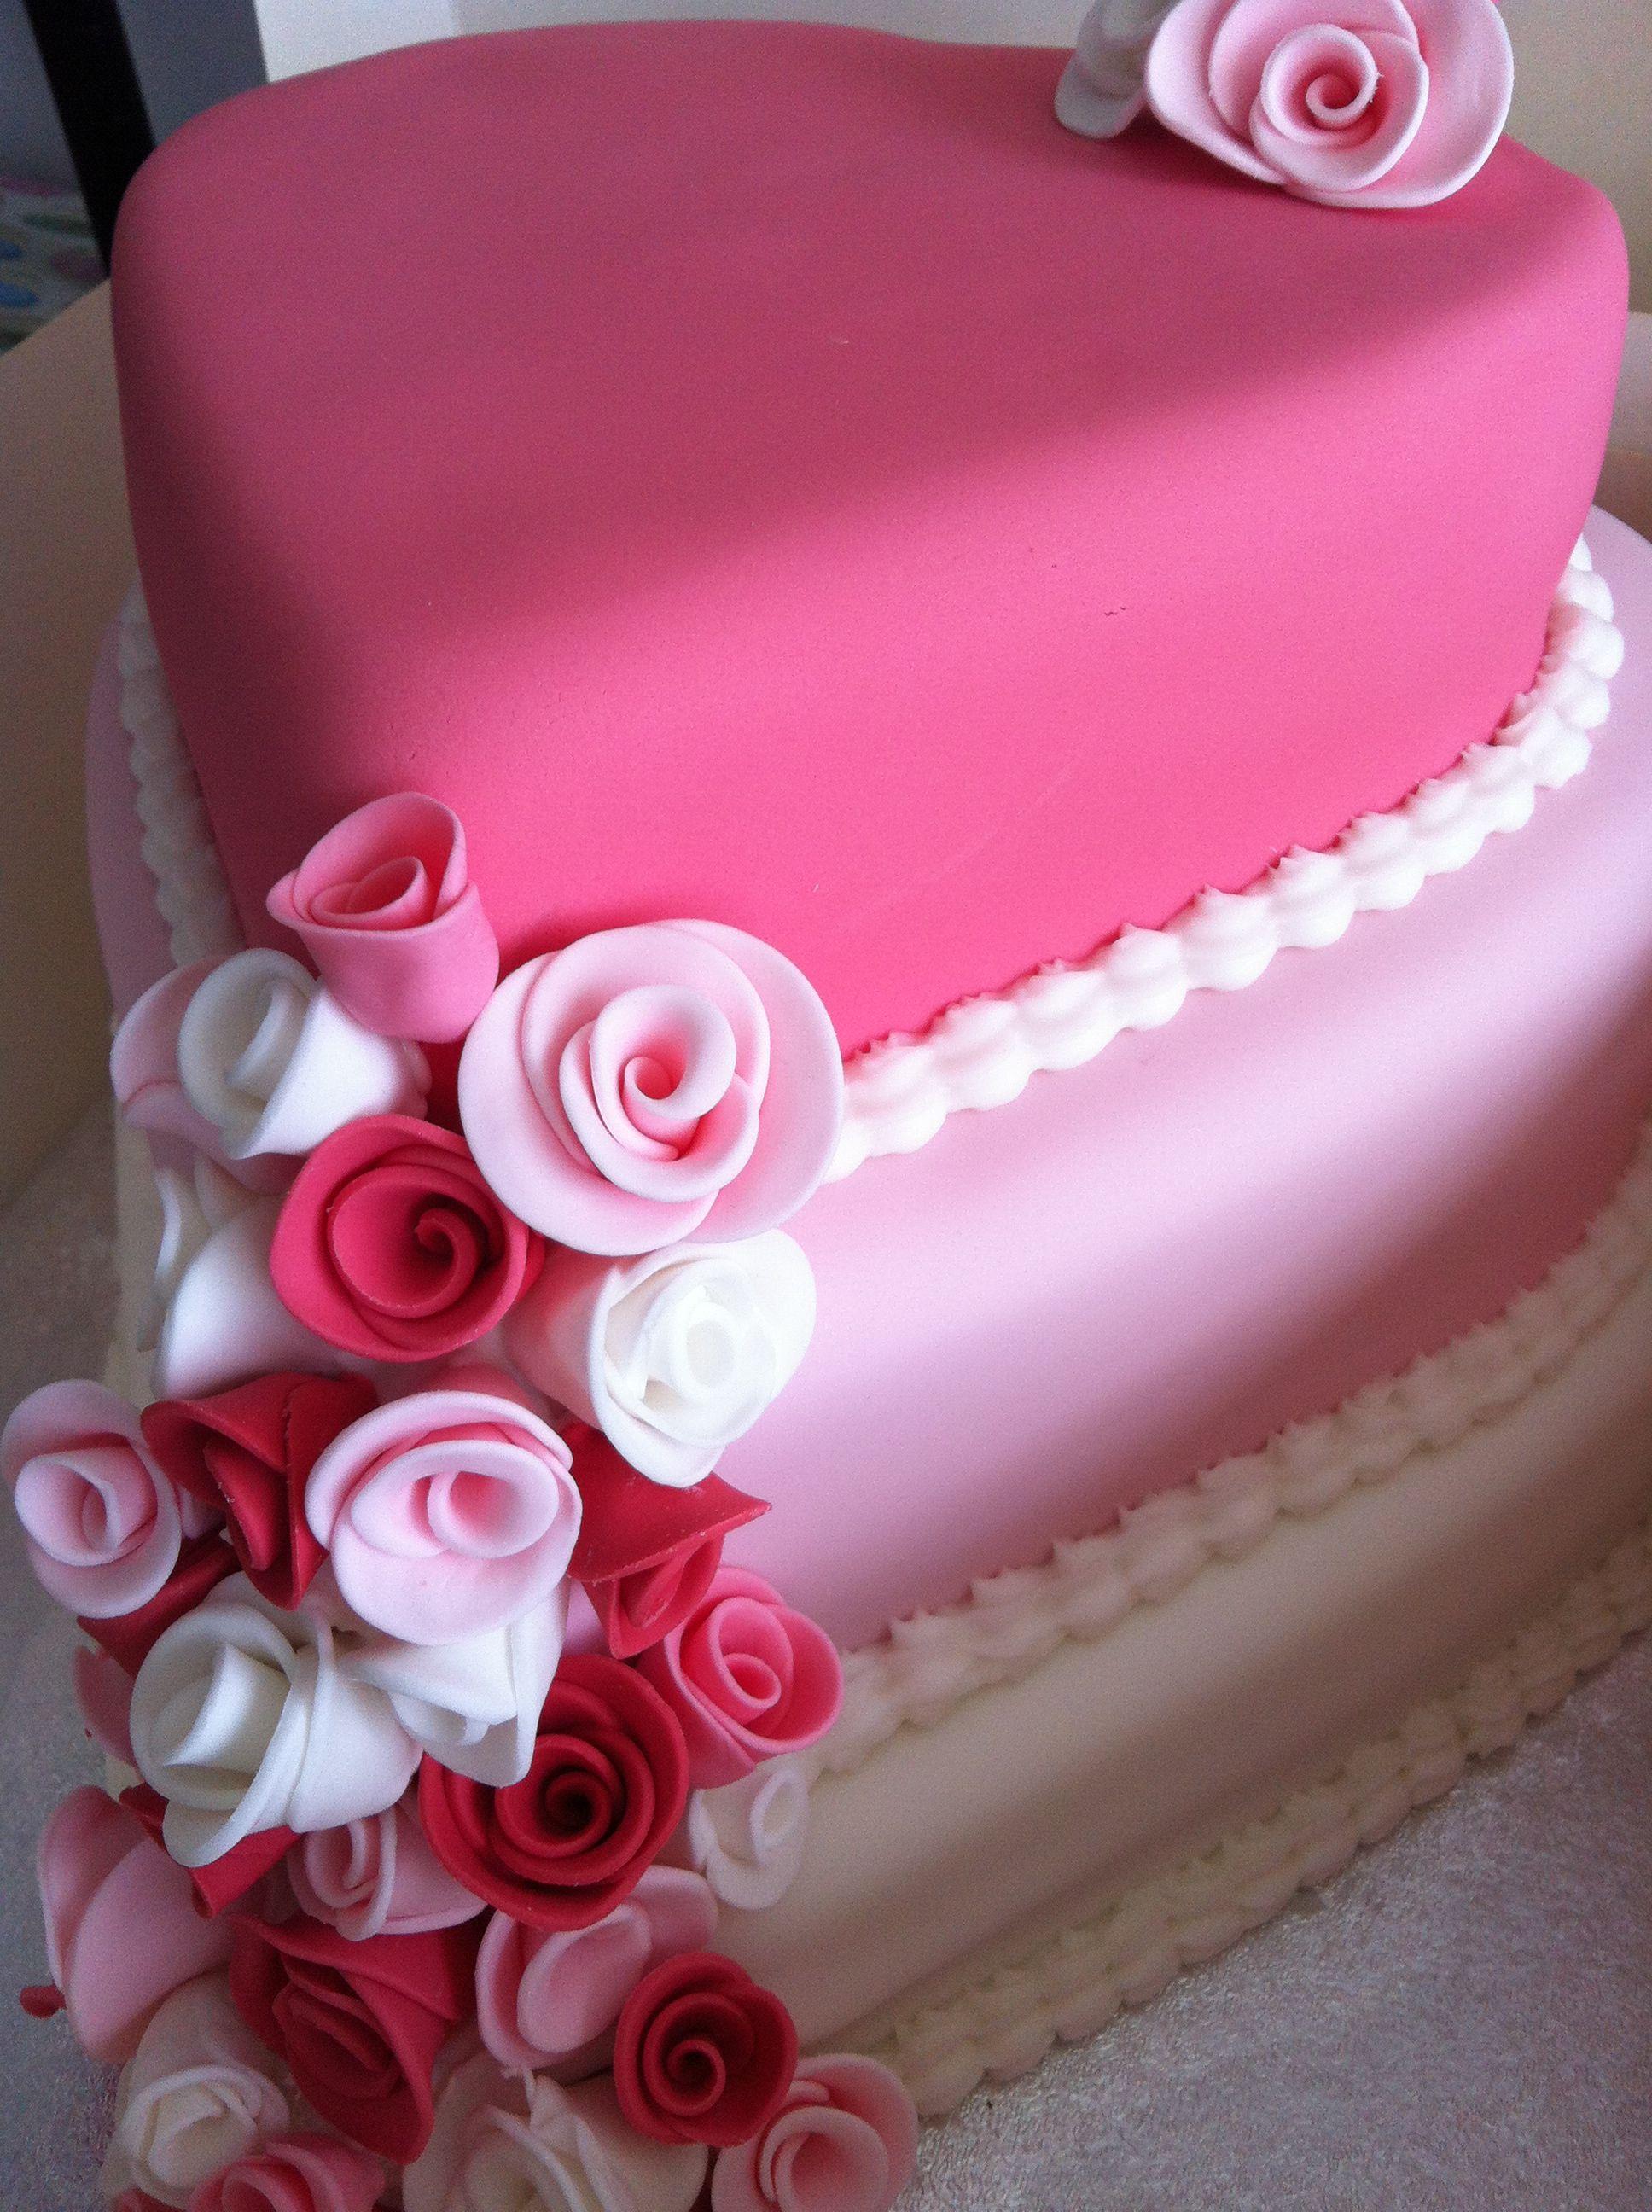 Three tiered pink heart shaped wedding cake adorned with handmade three tiered pink heart shaped wedding cake adorned with handmade sugar roses izmirmasajfo